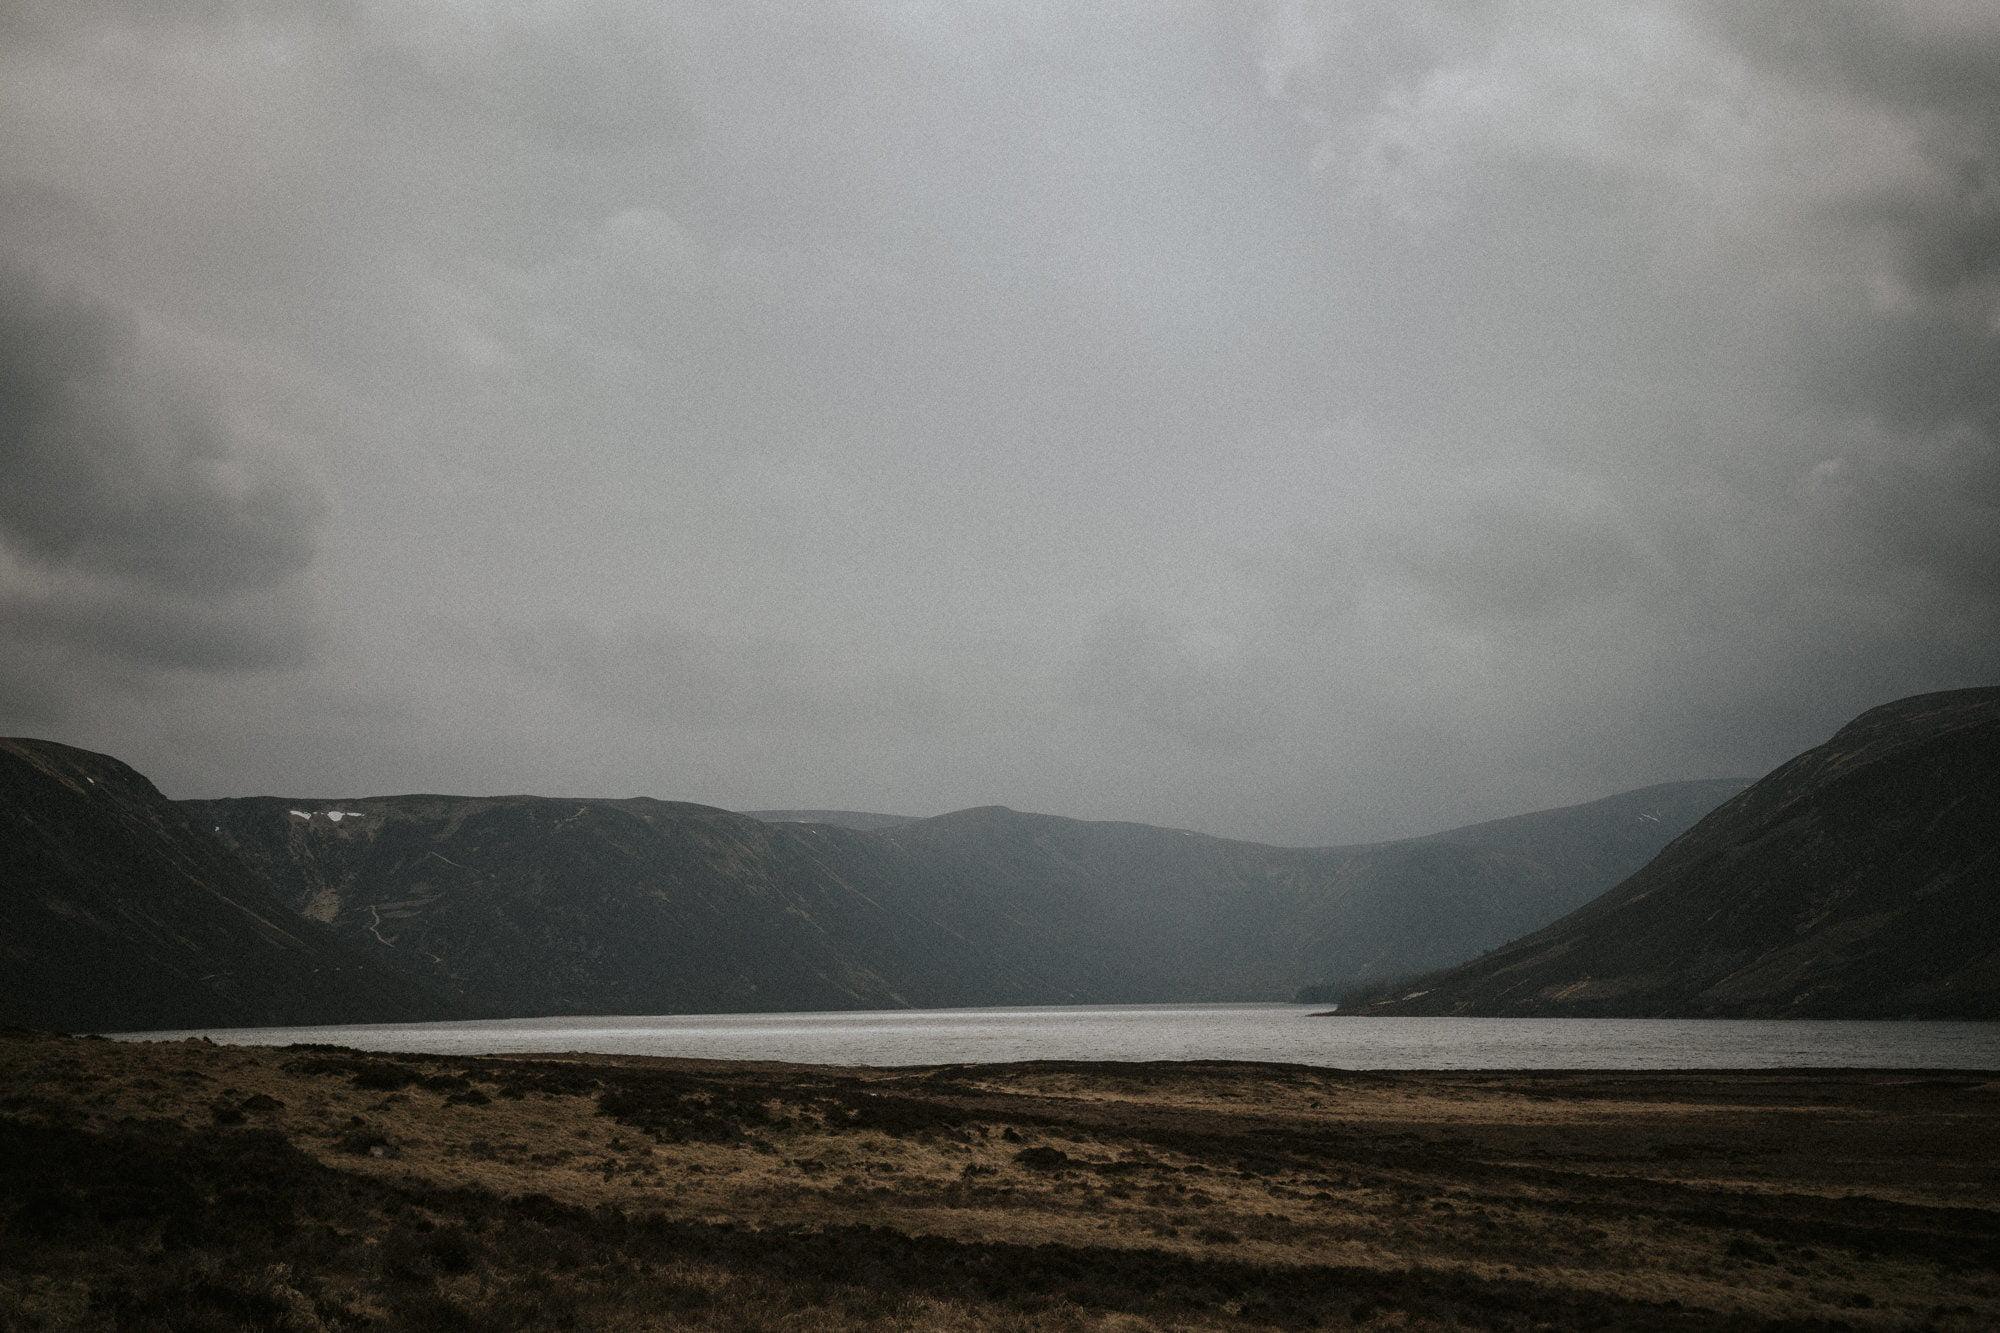 Loch Ullapie elopement, Aviemore elopement, Cairngorms elopement in the Scottish Highlands Lochs